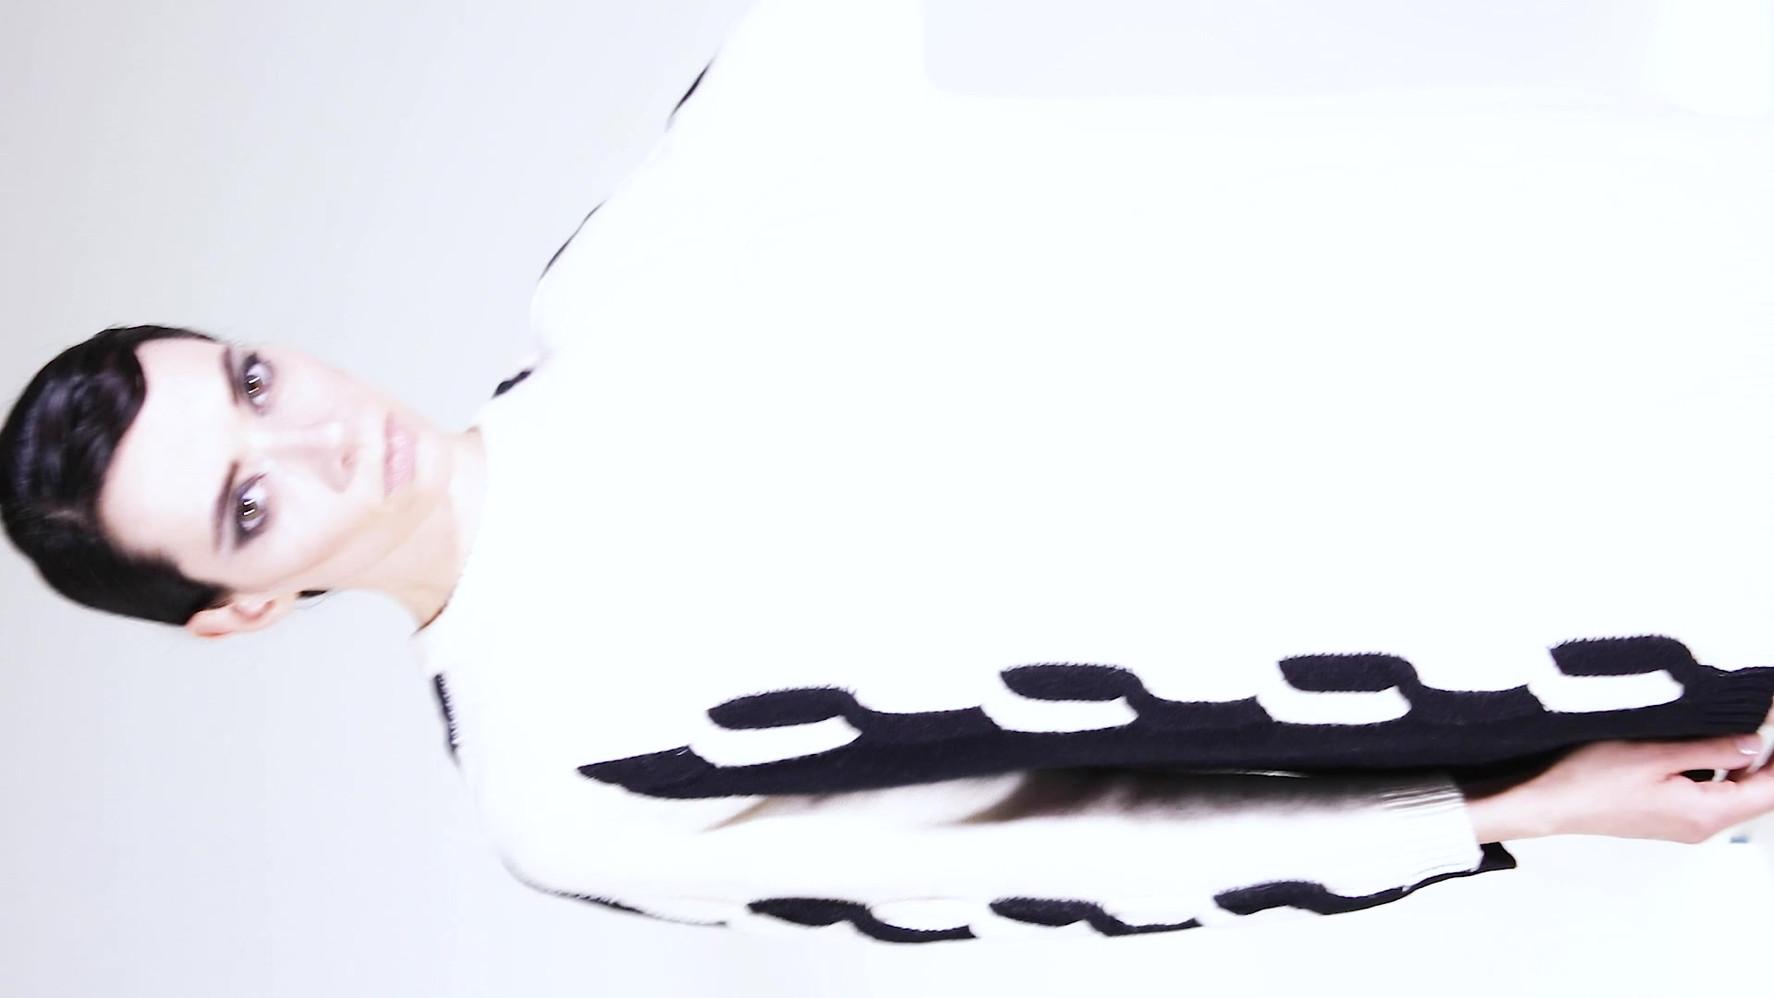 Video by Anna Bertozzi Styling Elisa Bacchi Model Giordana Vasquez for #PierAntonioGaspari Music by Monsieur Blumenberg